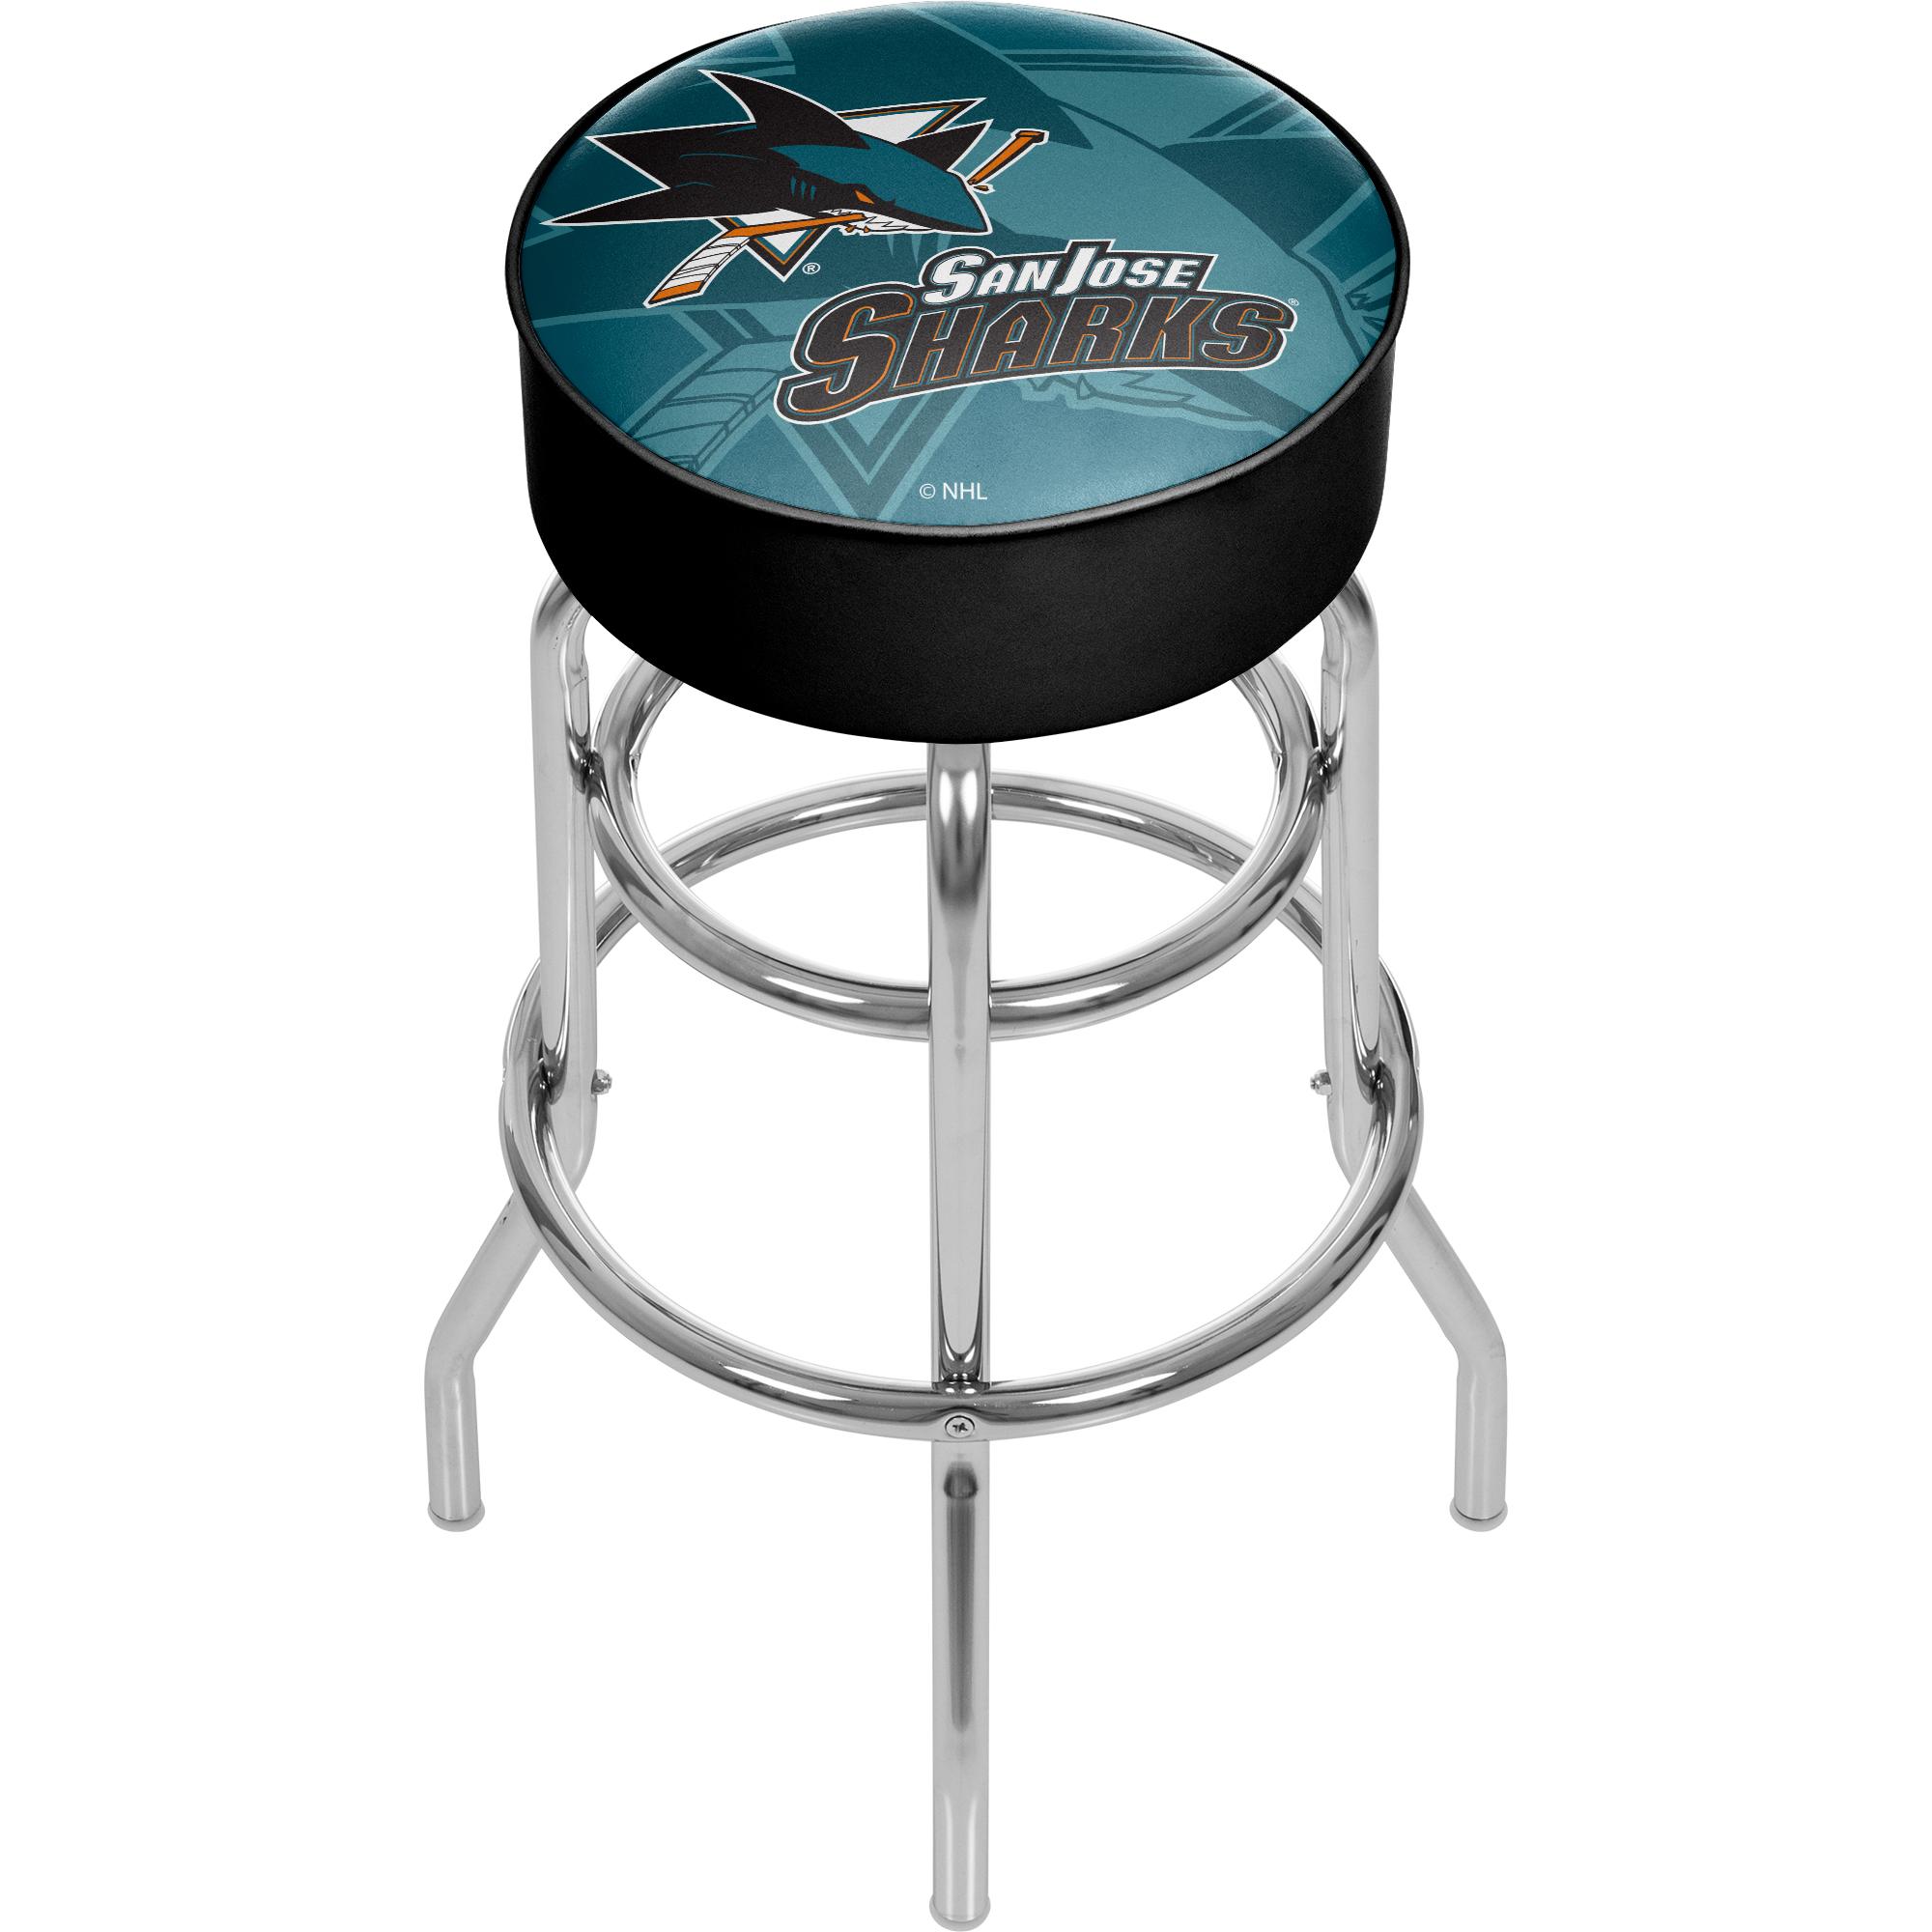 NHL Chrome Bar Stool with Swivel - Watermark - San Jose Sharks